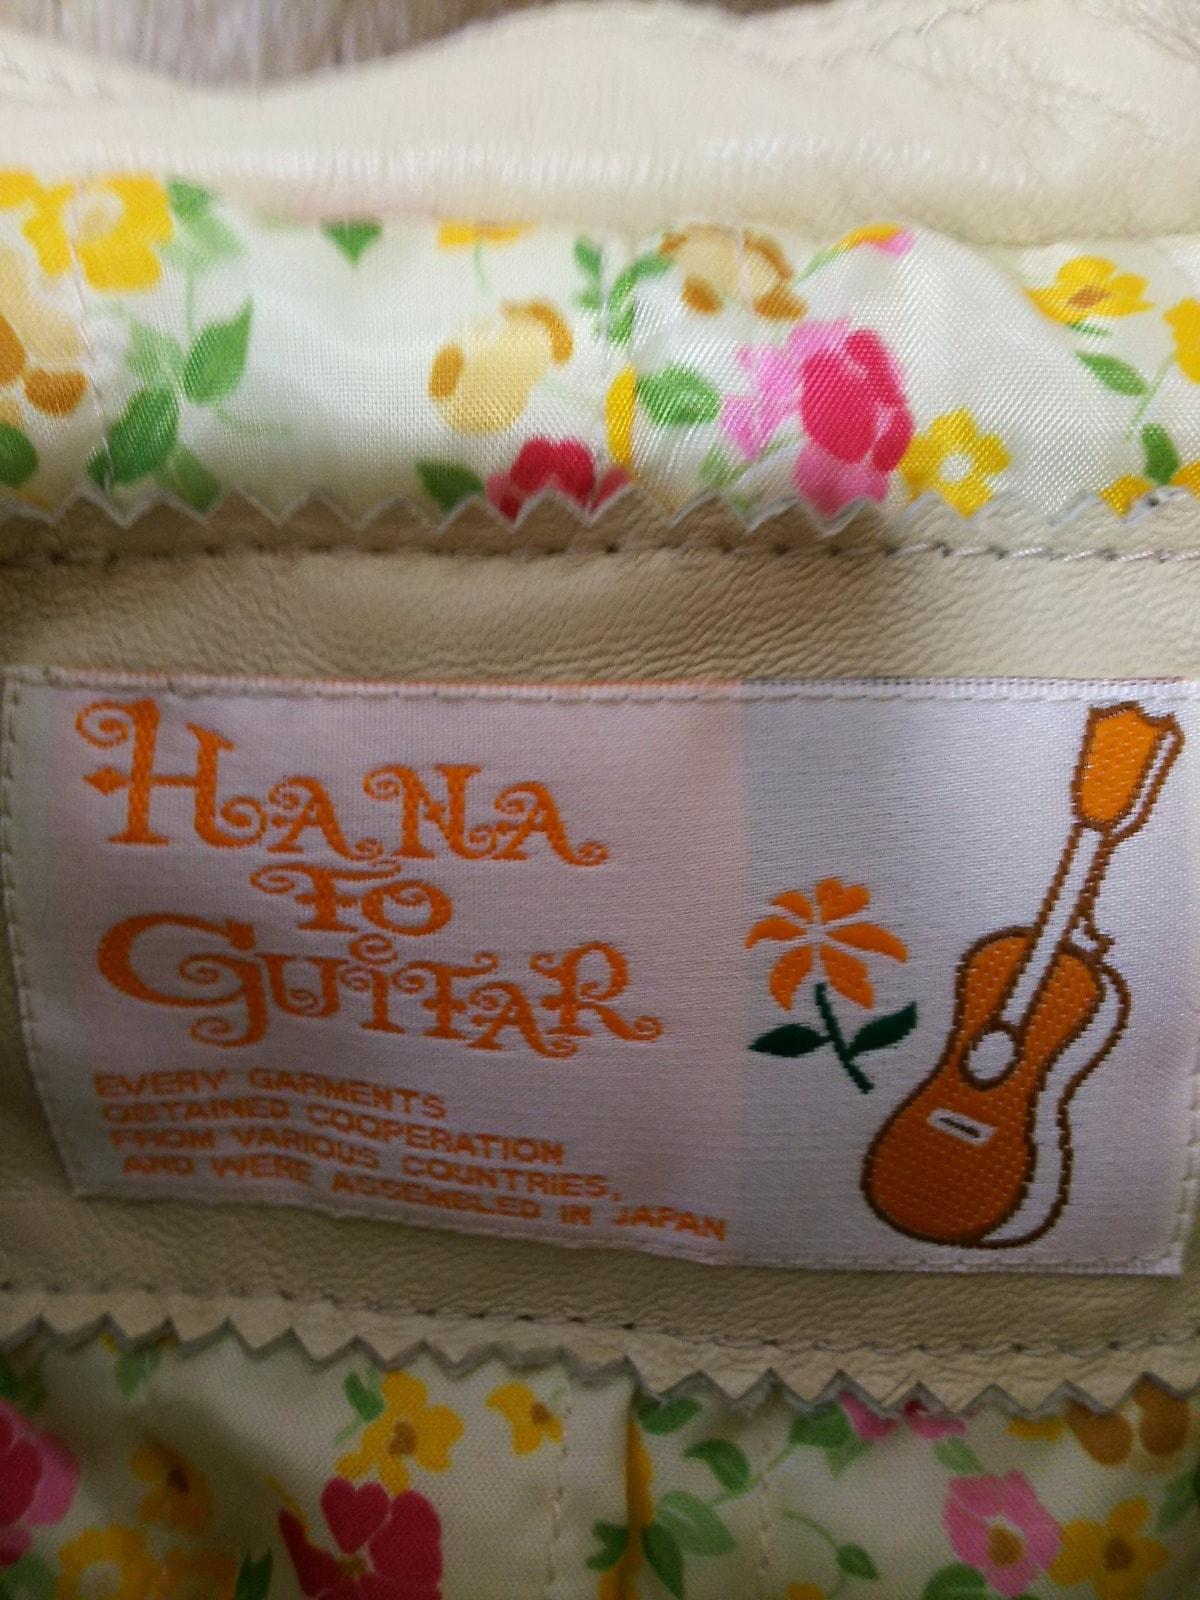 HANA TO GUITAR(ハナトギター)のコート